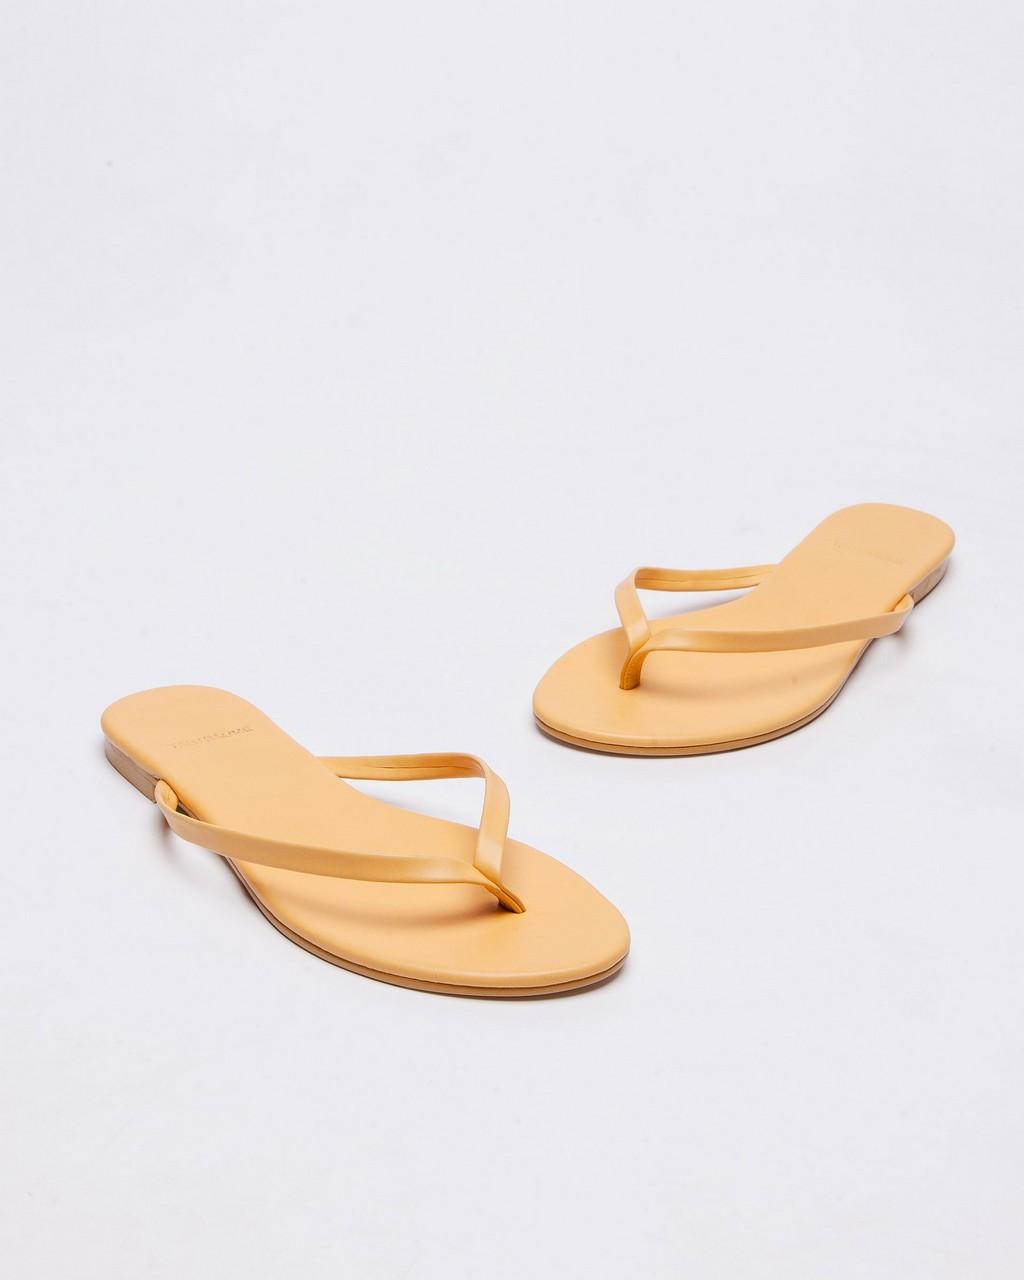 Tagtraume Plasma-02 - Orange(오렌지)